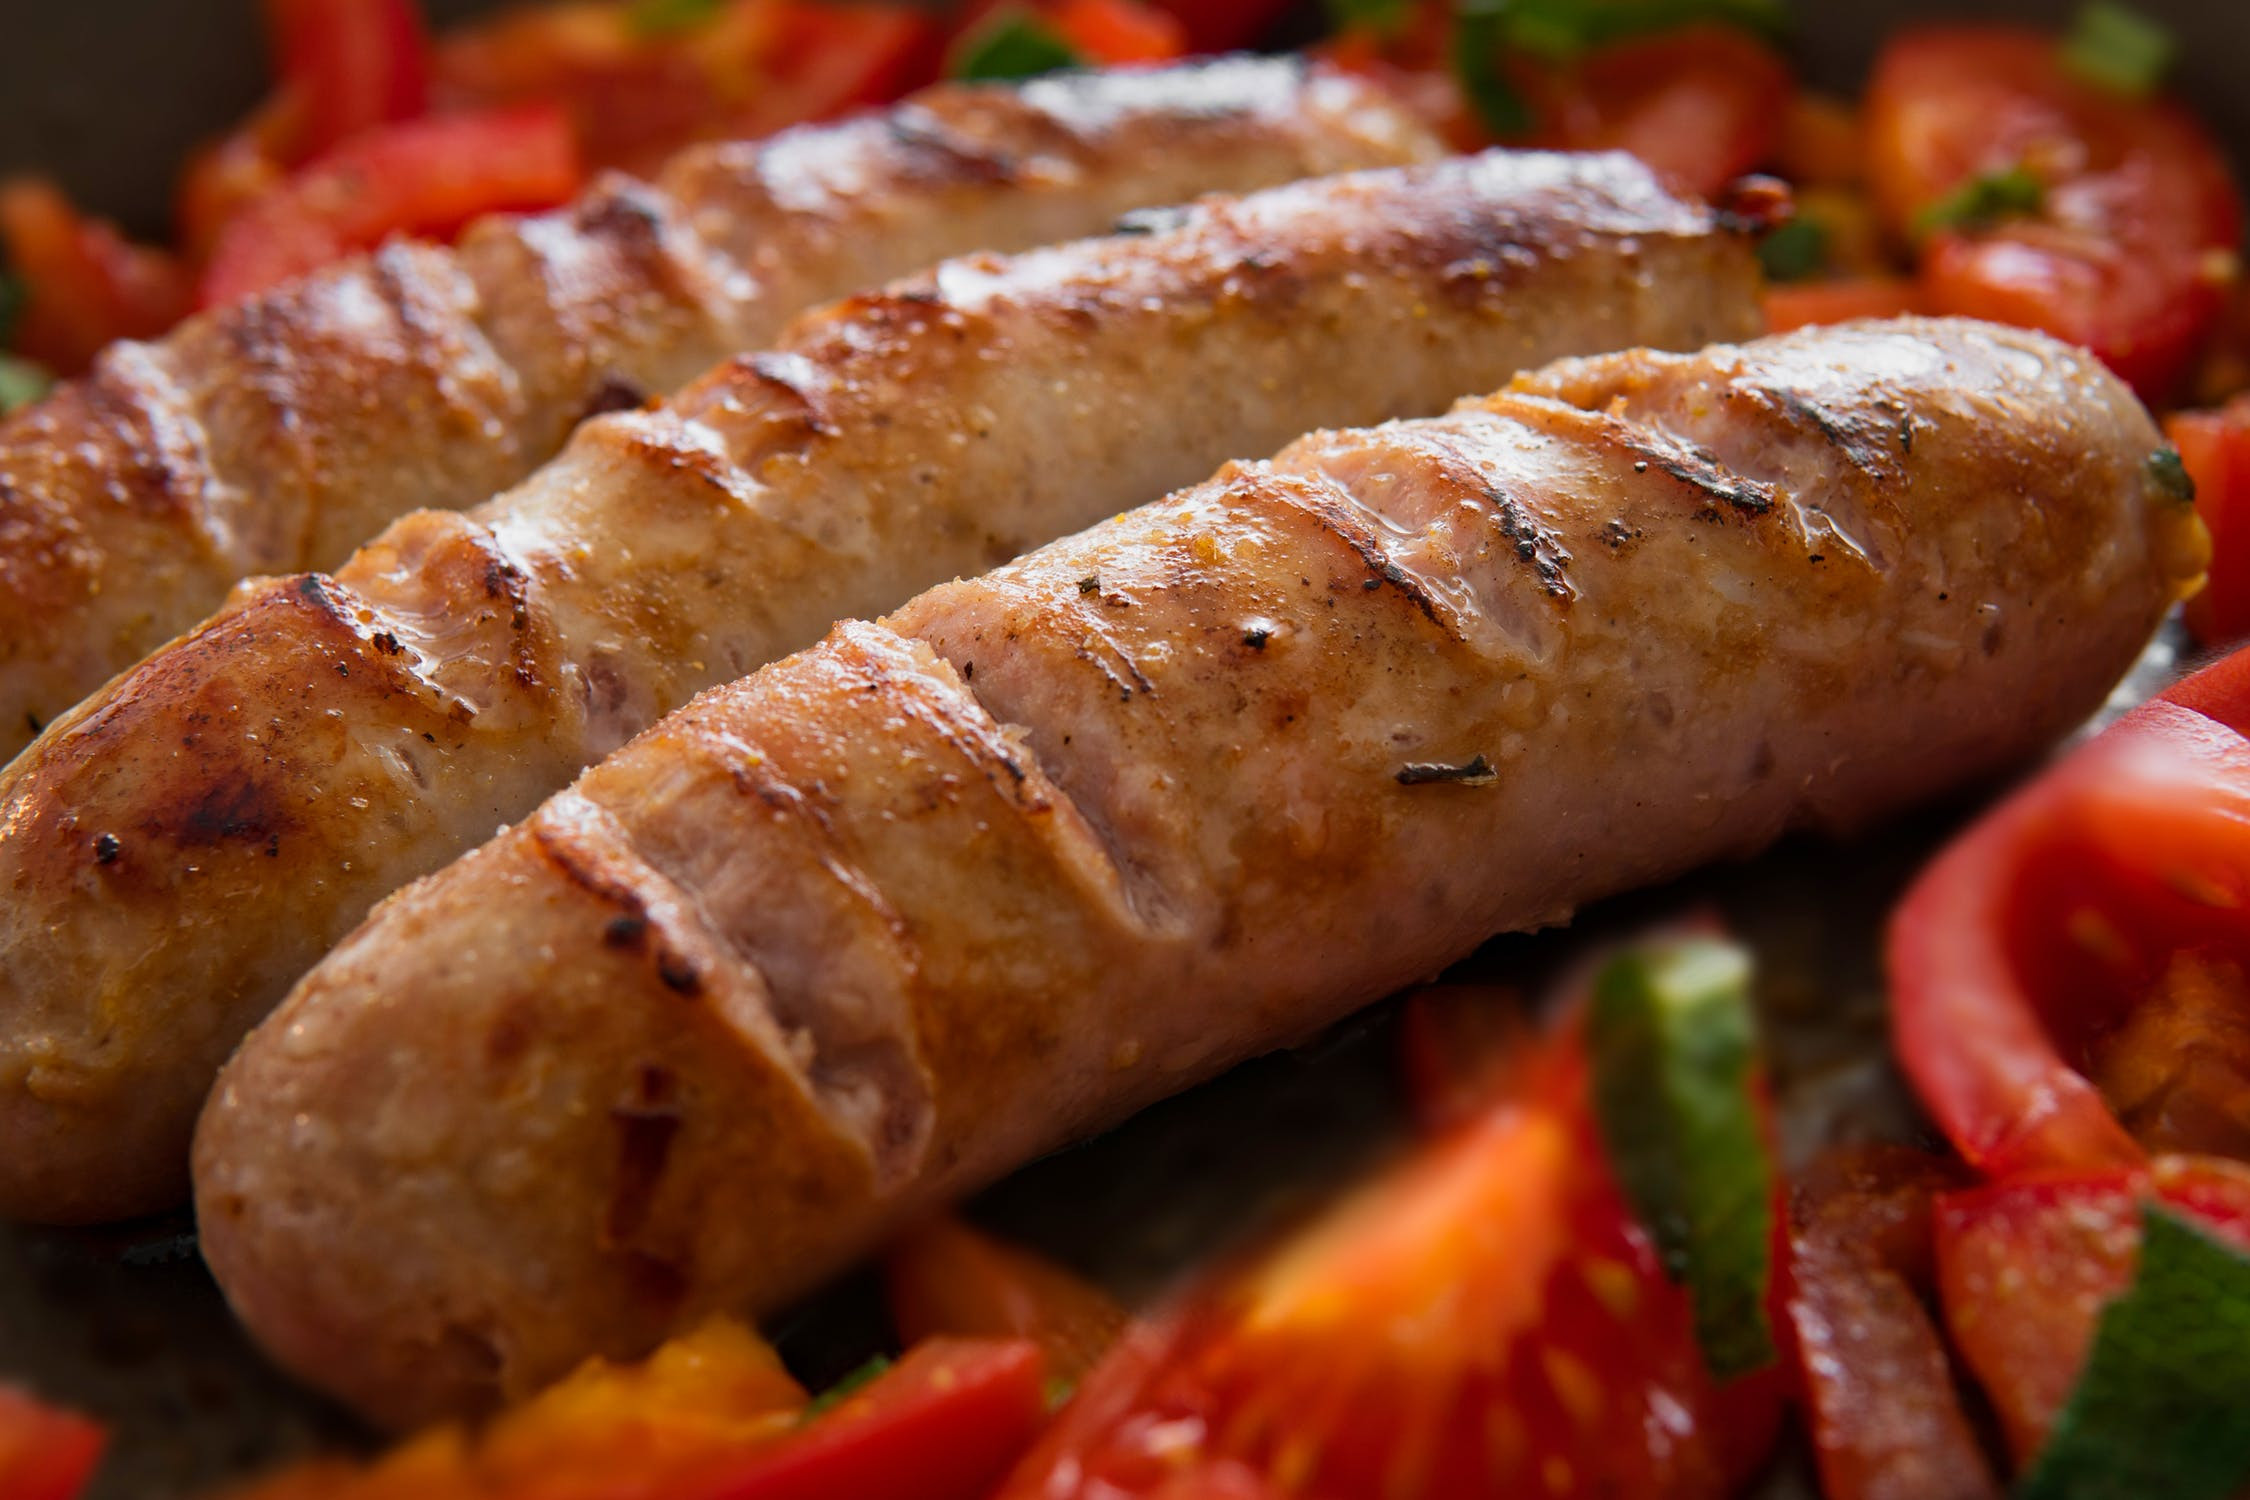 Pork Kielbasa Breakfast Sausage Links, 20-pack